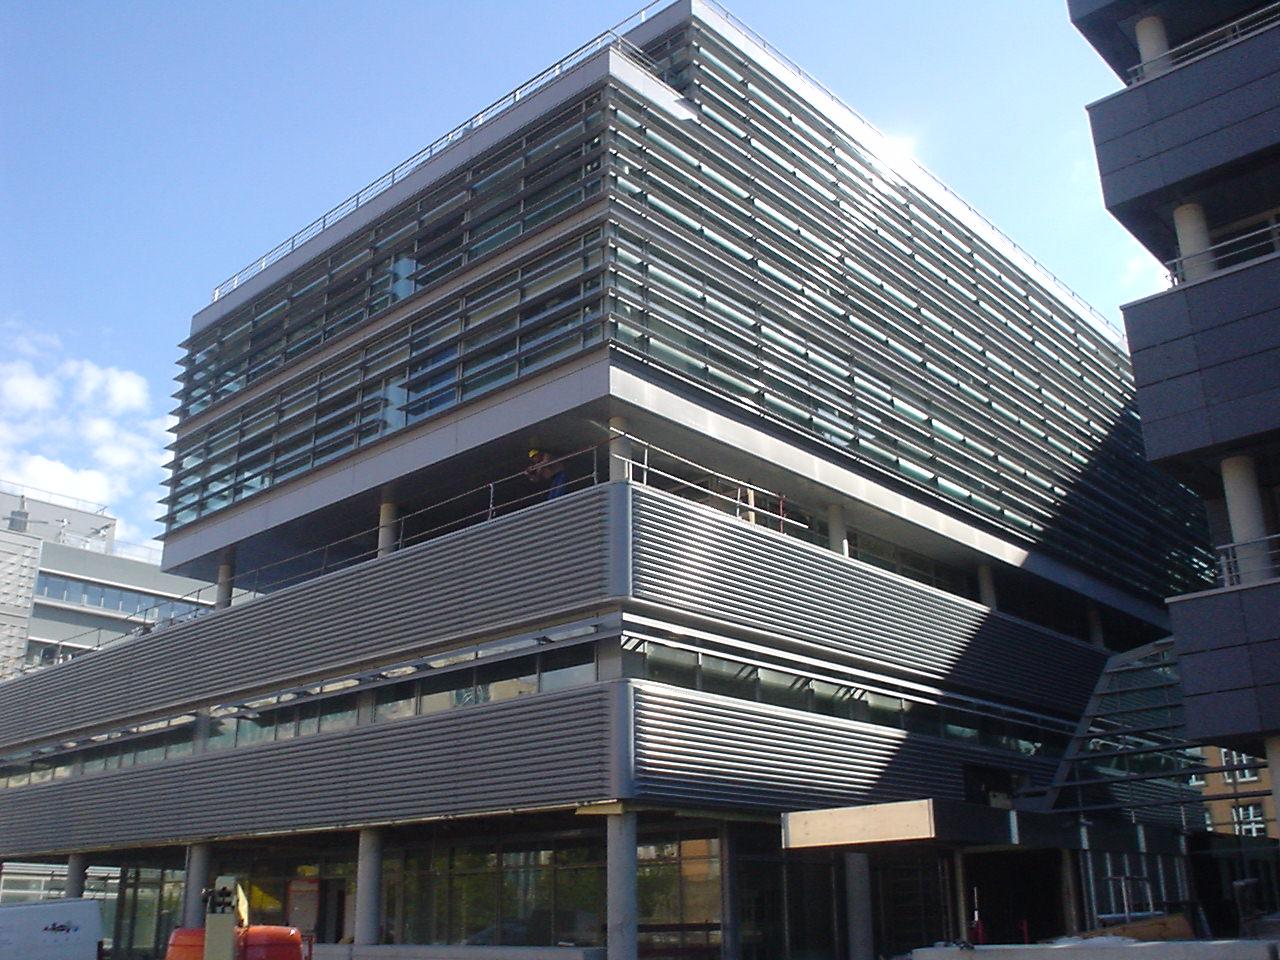 Nouvel Hopital Civil Strasbourg